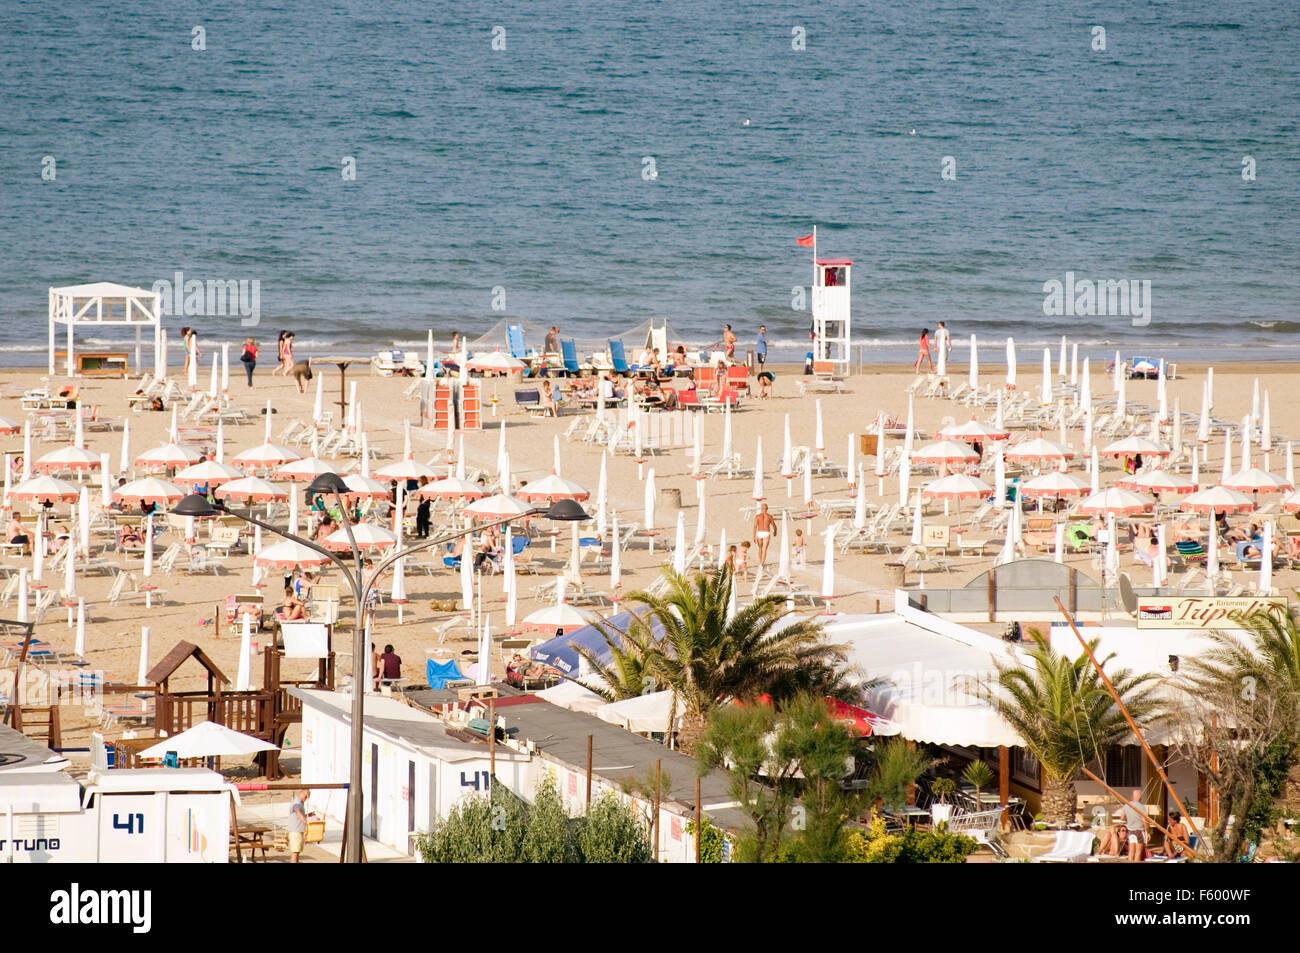 Rimini italy italian beach beaches east coast Adriatic Sea coastline resort town - Stock Image